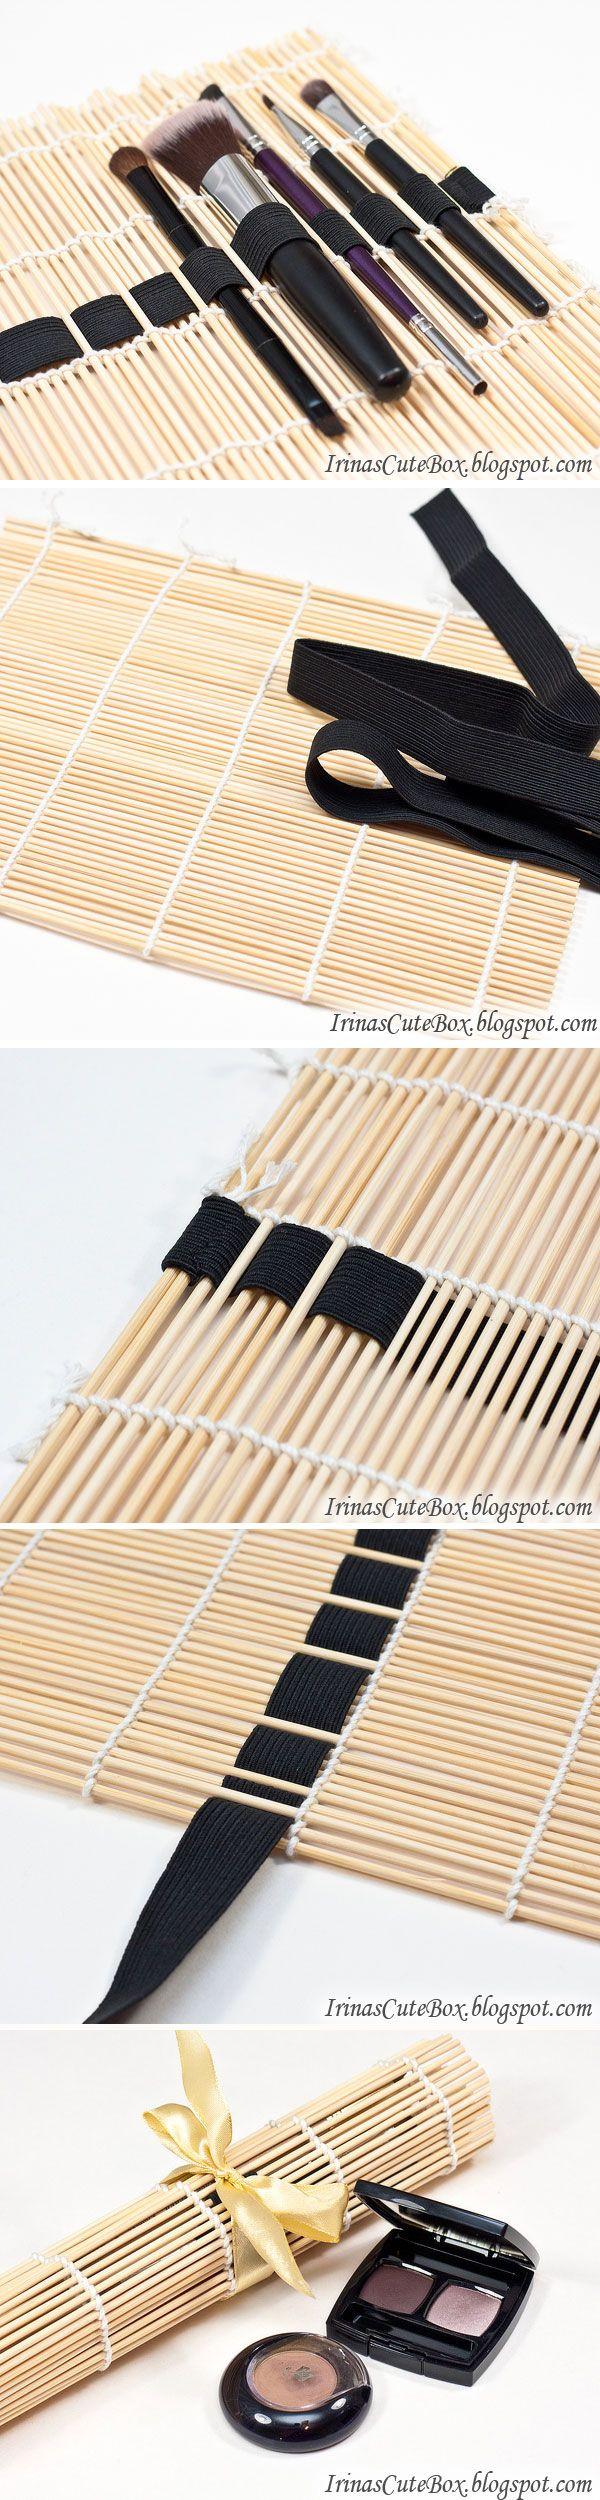 A tutorial how to make brush organizer of sushi mat and elastic. Click here for full tutorial: http://irinascutebox.blogspot.com/2013/02/how-to-make-brush-organizer.html